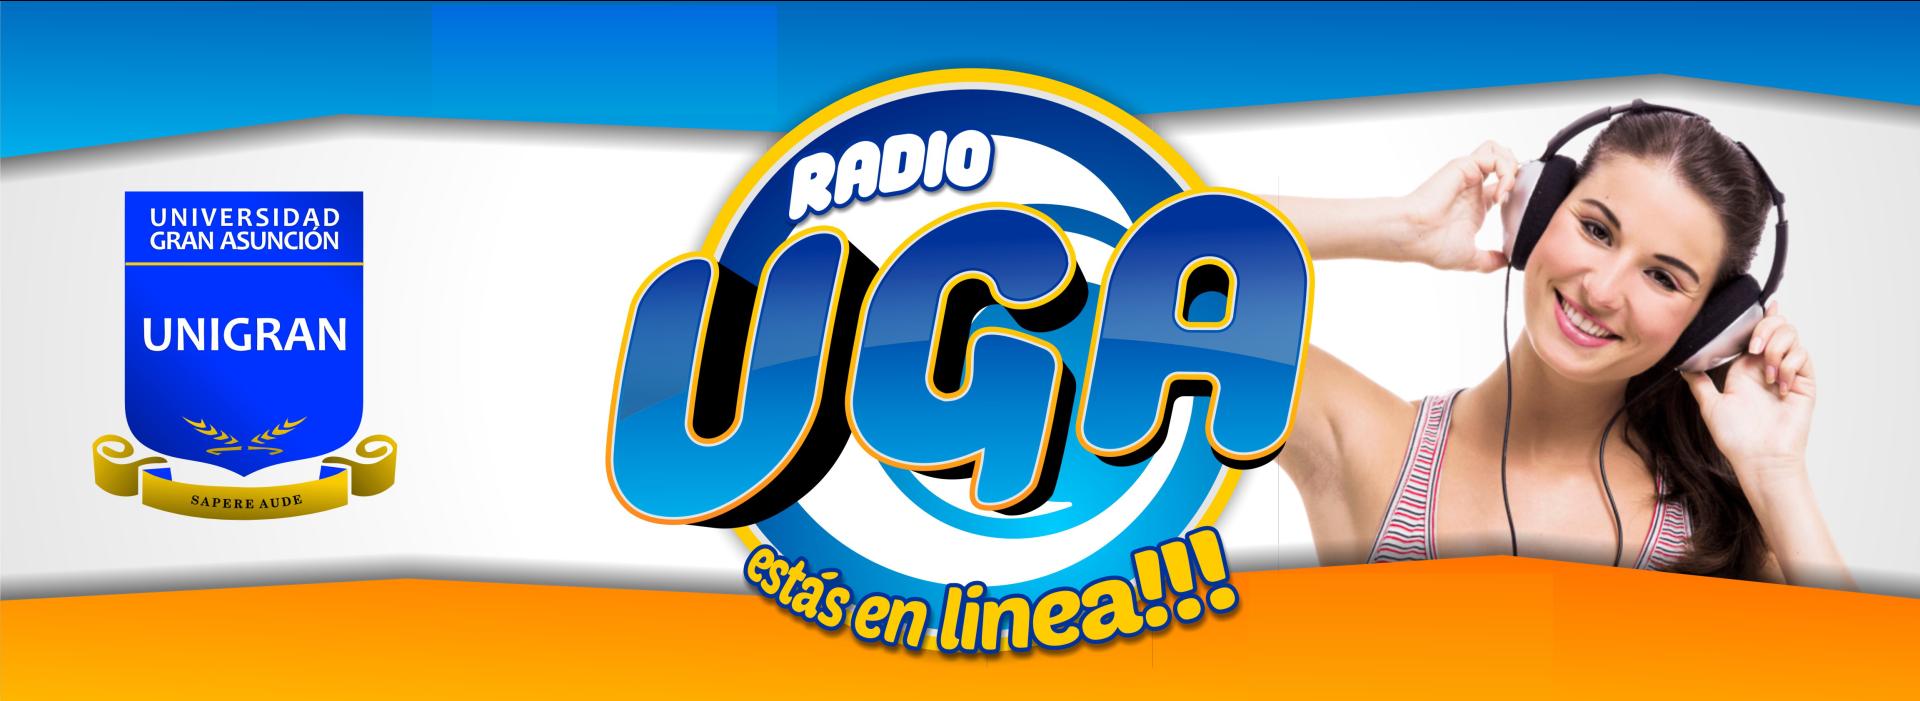 UGA RADIO online